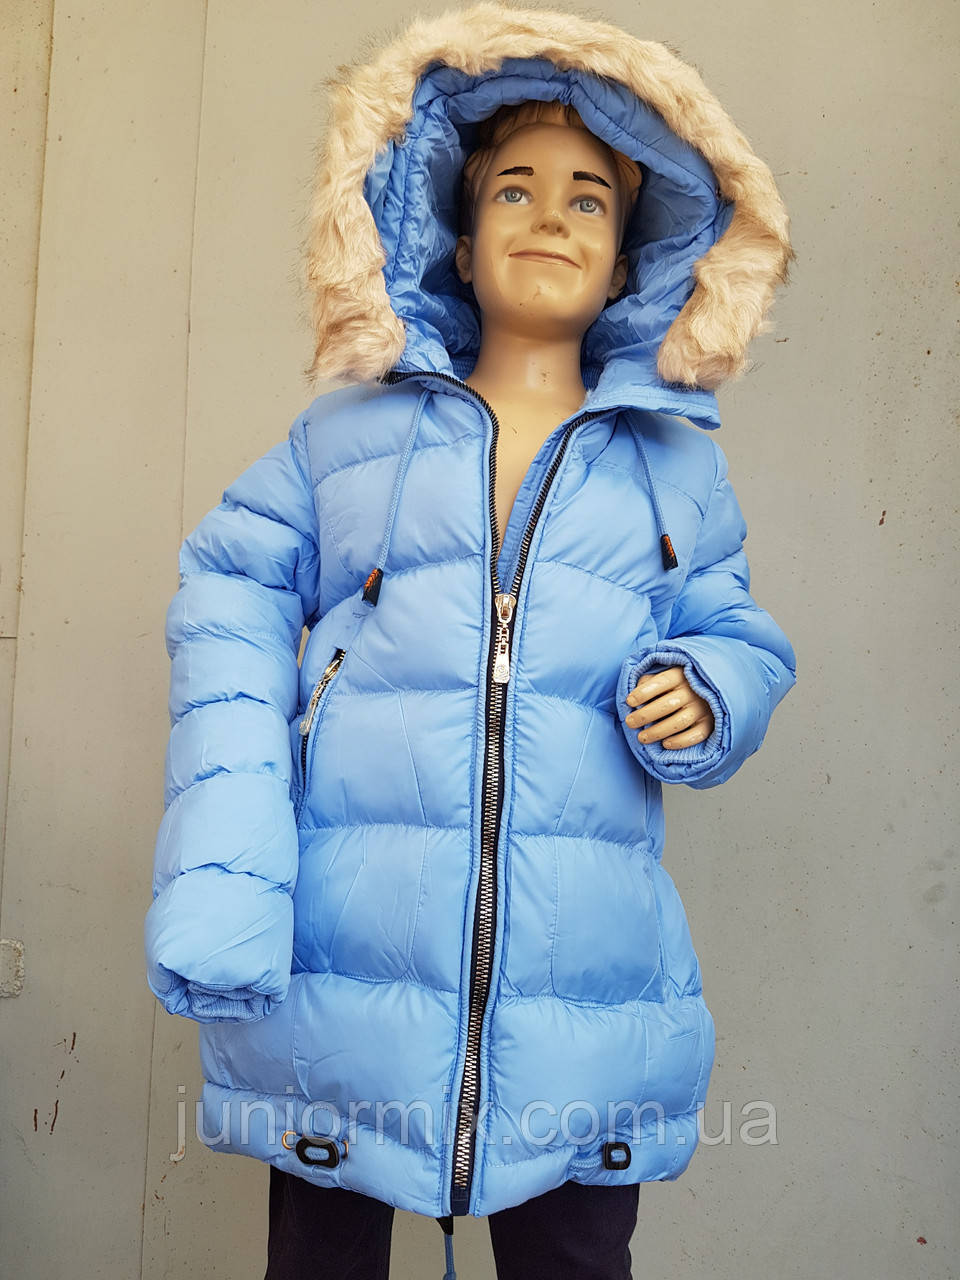 0439602b2561 Куртка зимняя на девочку подросток HIKIS с колокольчиками